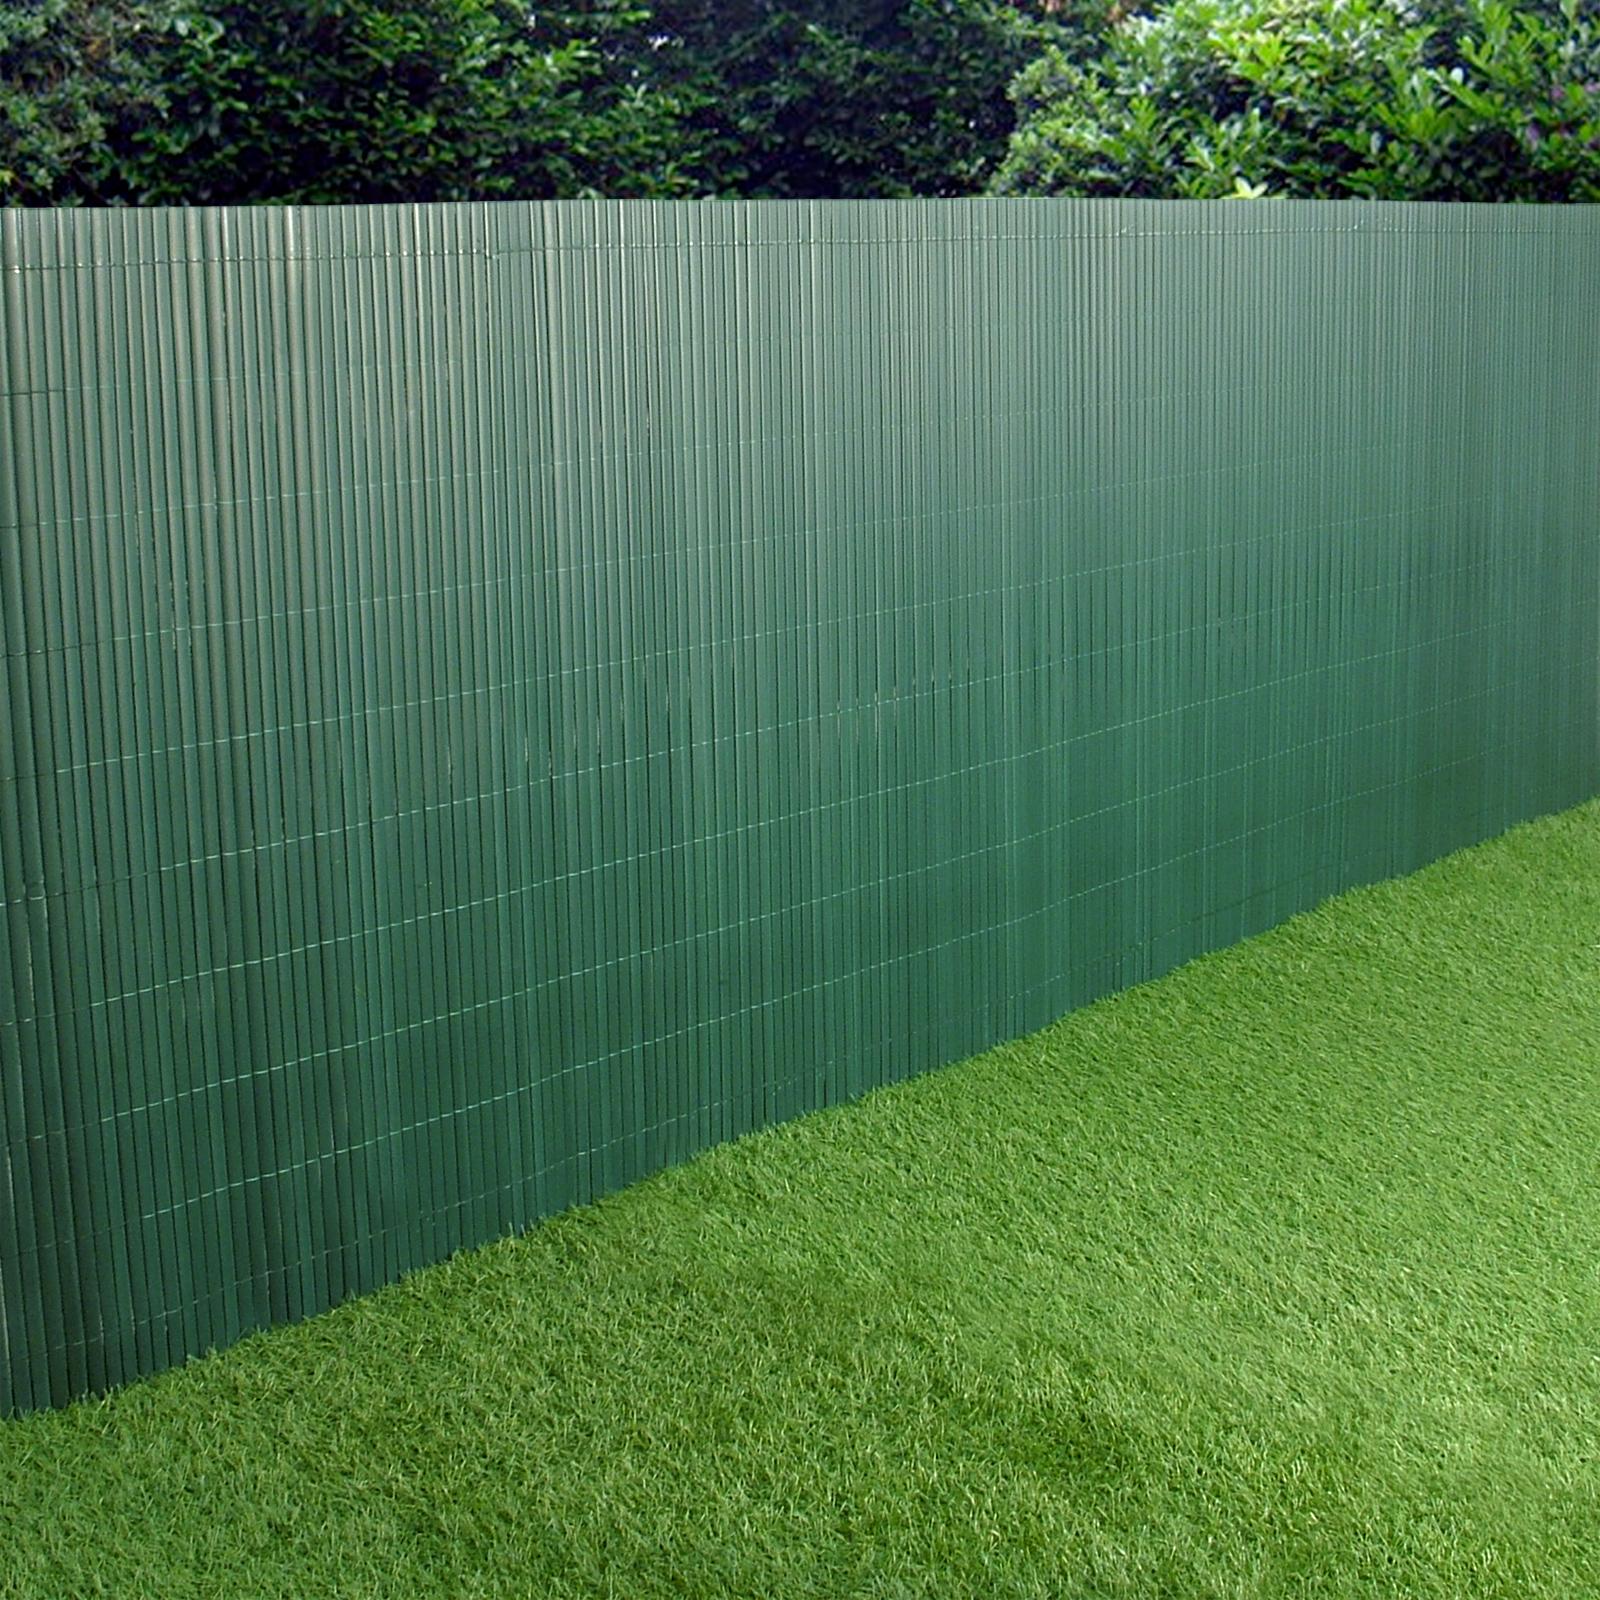 pvc garden fence plastic panel screen double faced green